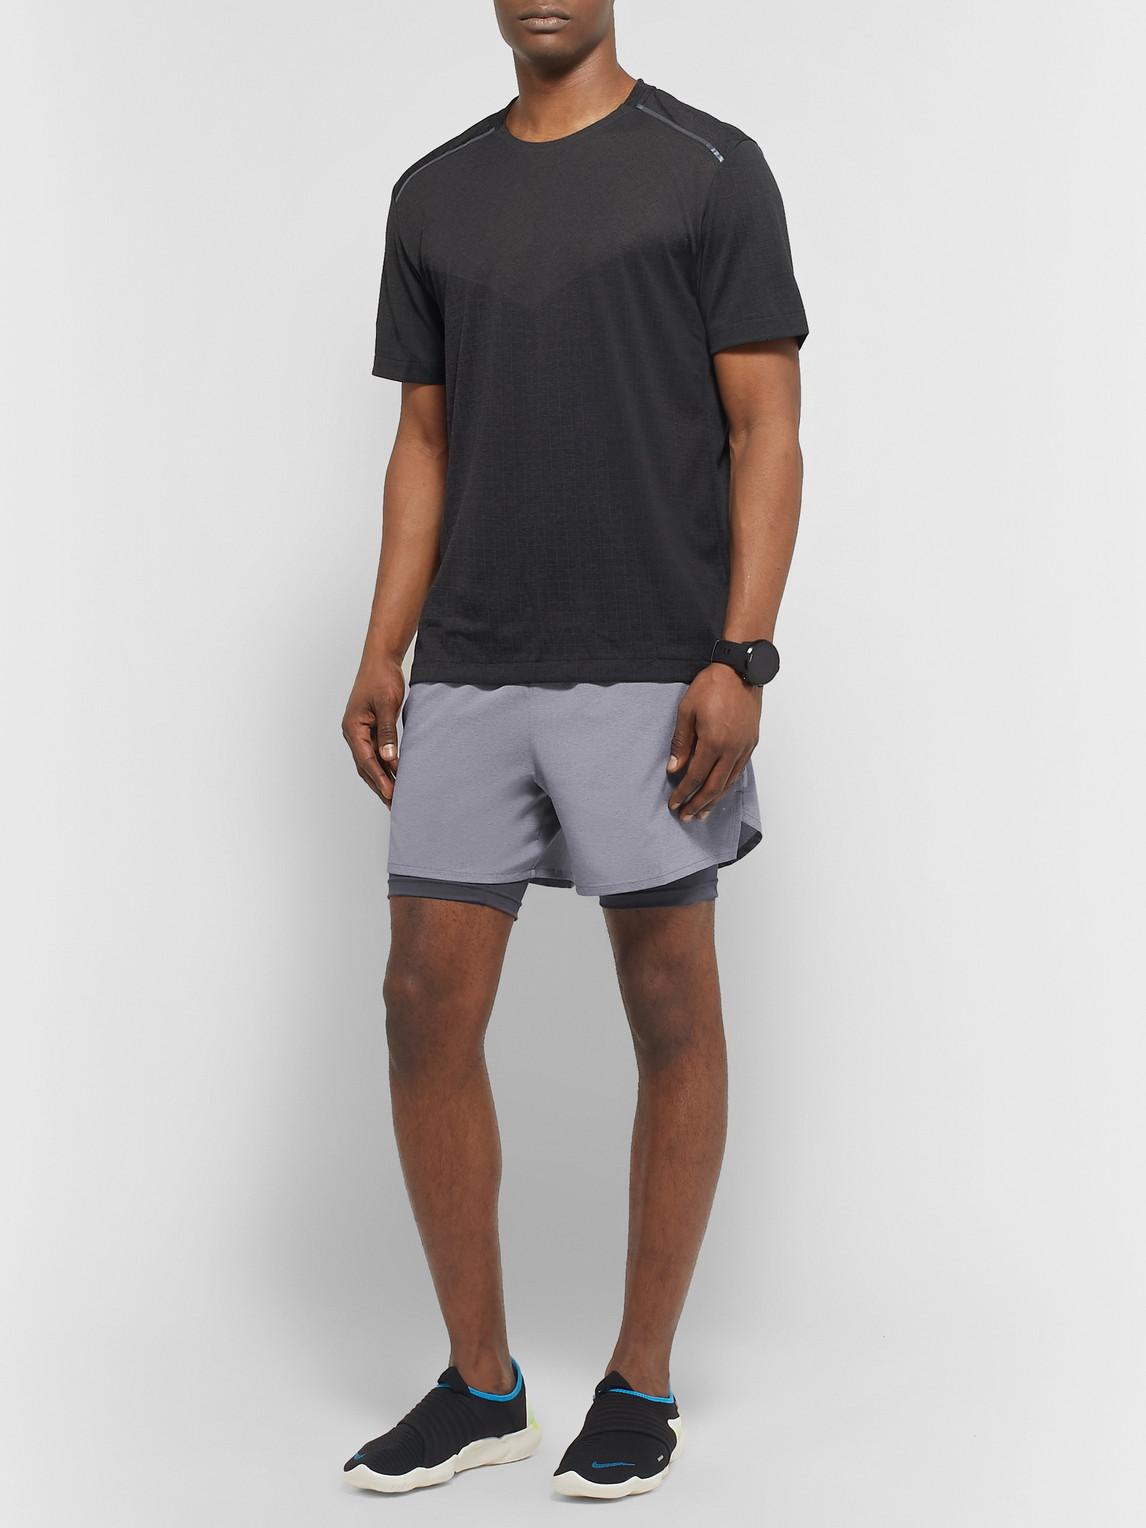 Nike Tops STRIDE 2